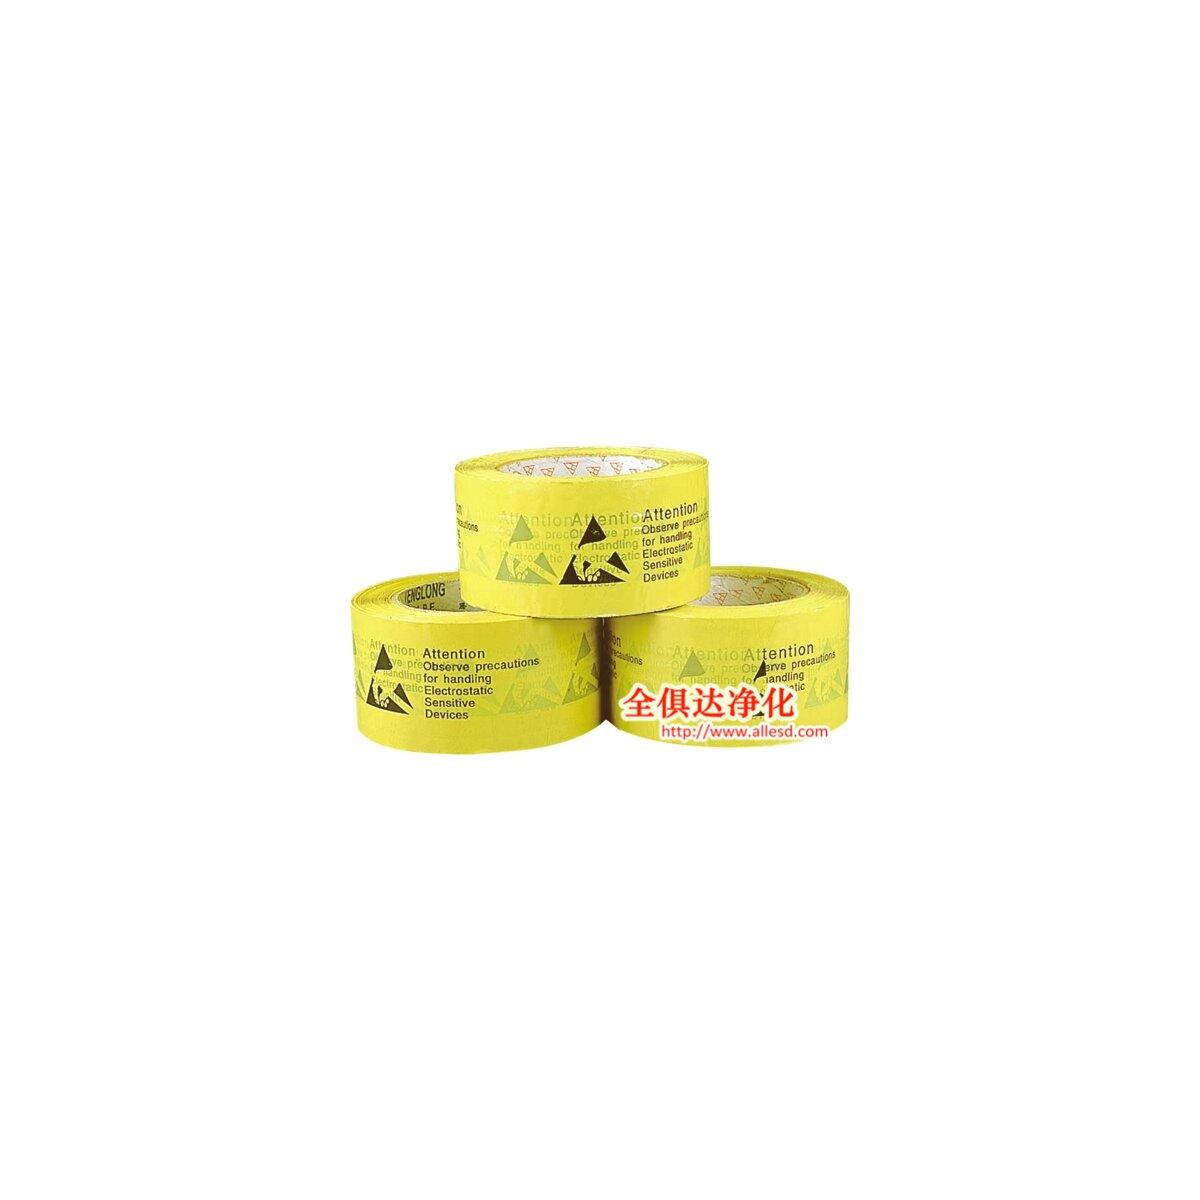 Minadax ESD Warning Tape Yellow